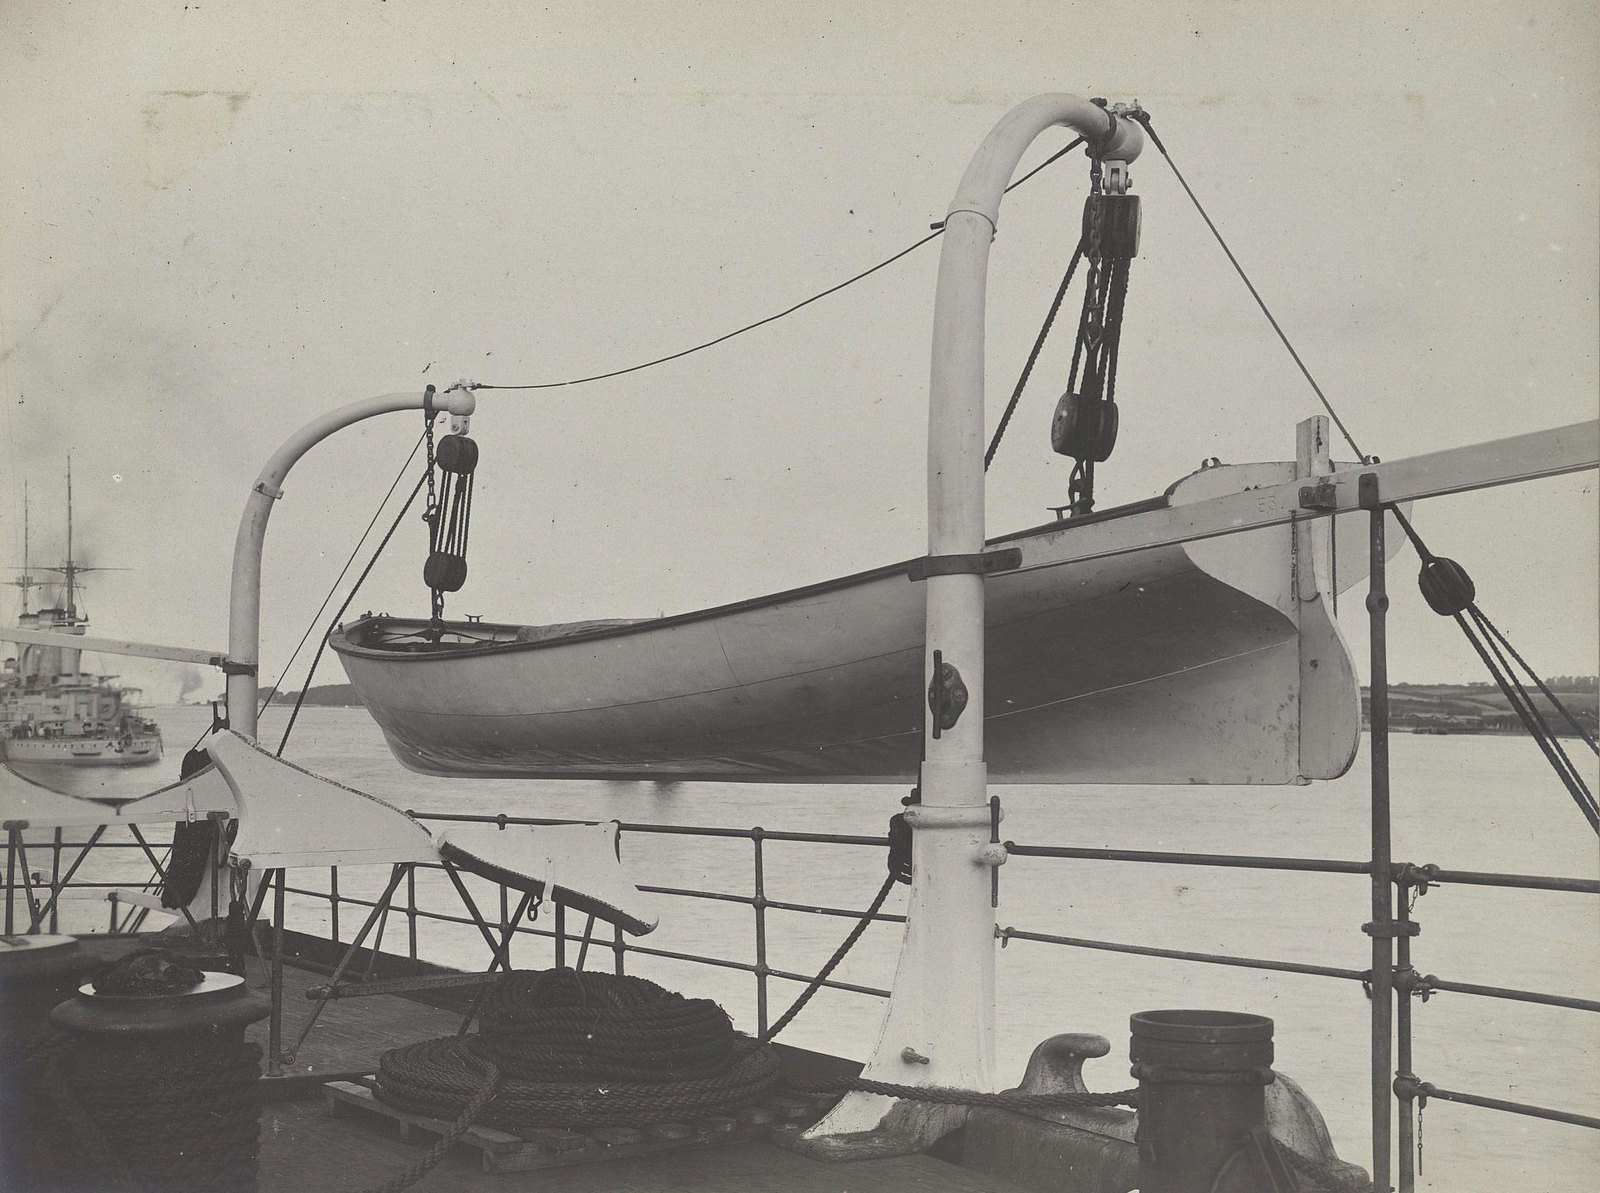 21. Шлюпка на борту корабля. 1901-1902 гг.